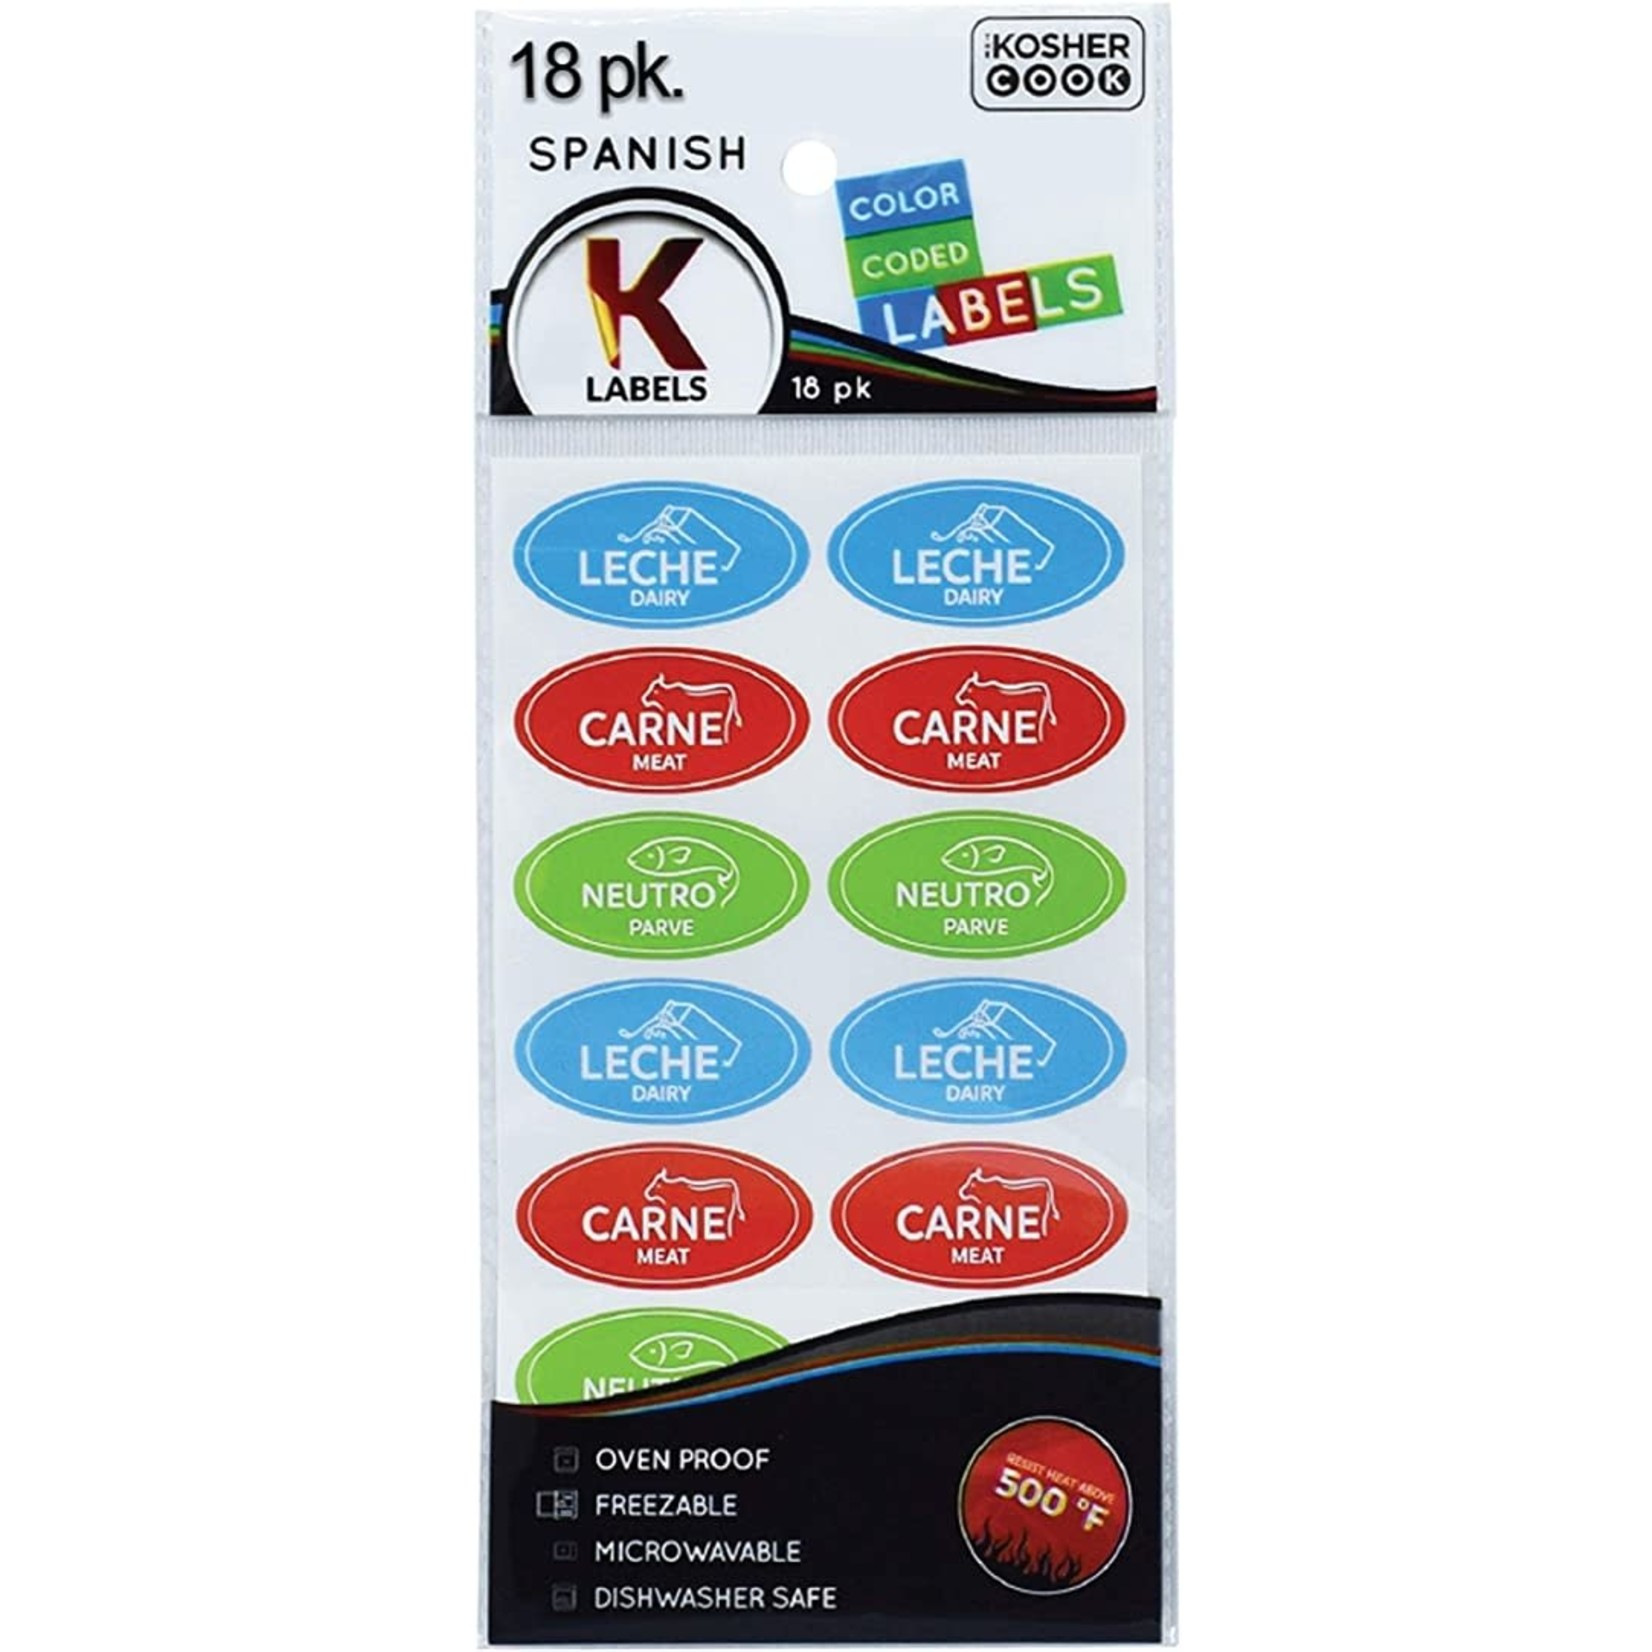 Kosher Labels18pk. Spanish - Assorted